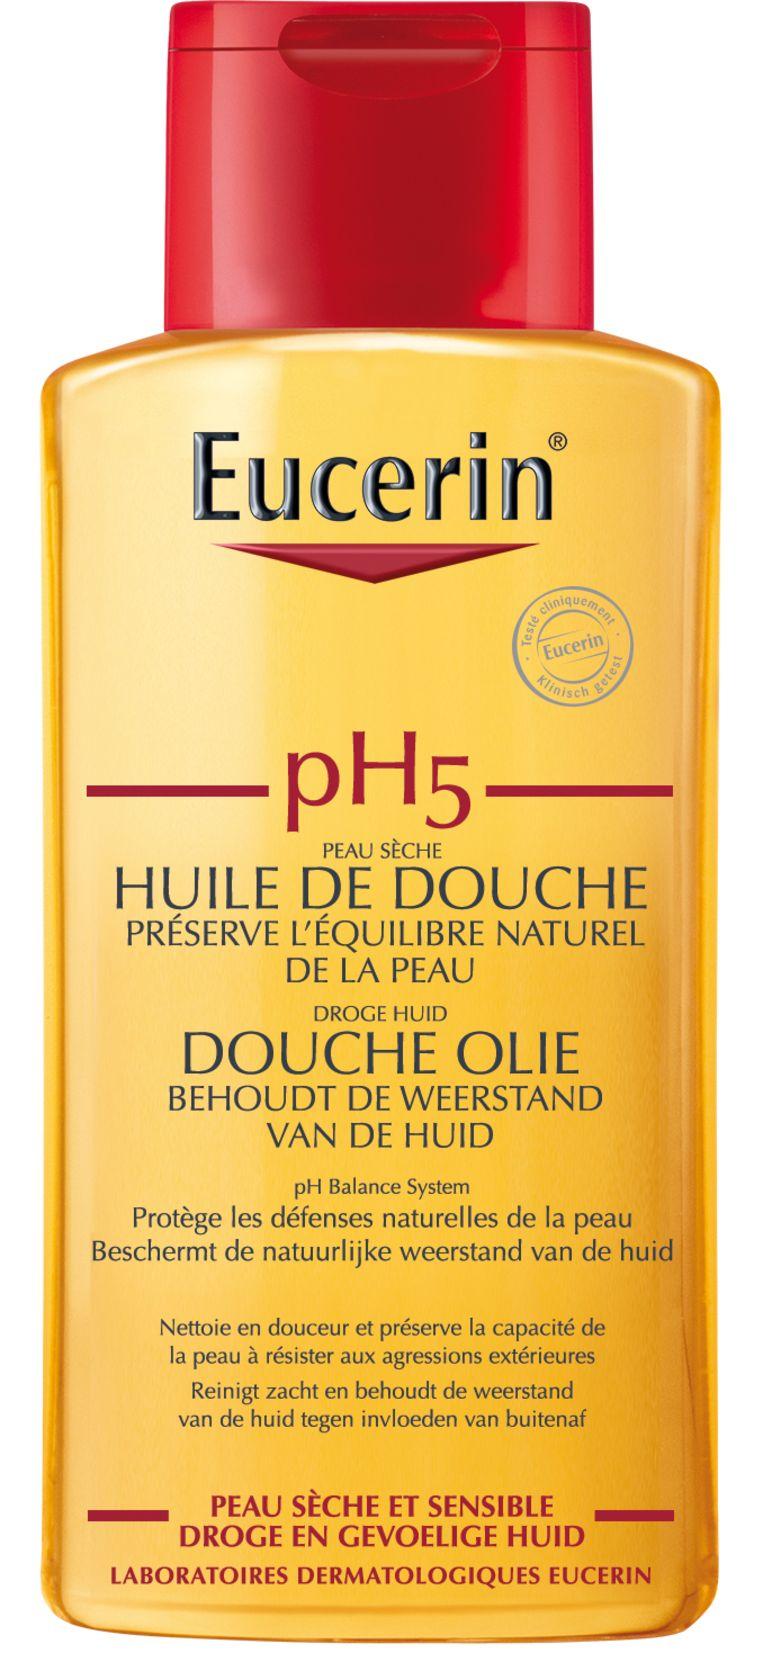 Eucerin, pH5-doucheolie 200 ml, 11,50 euro  Beeld RV